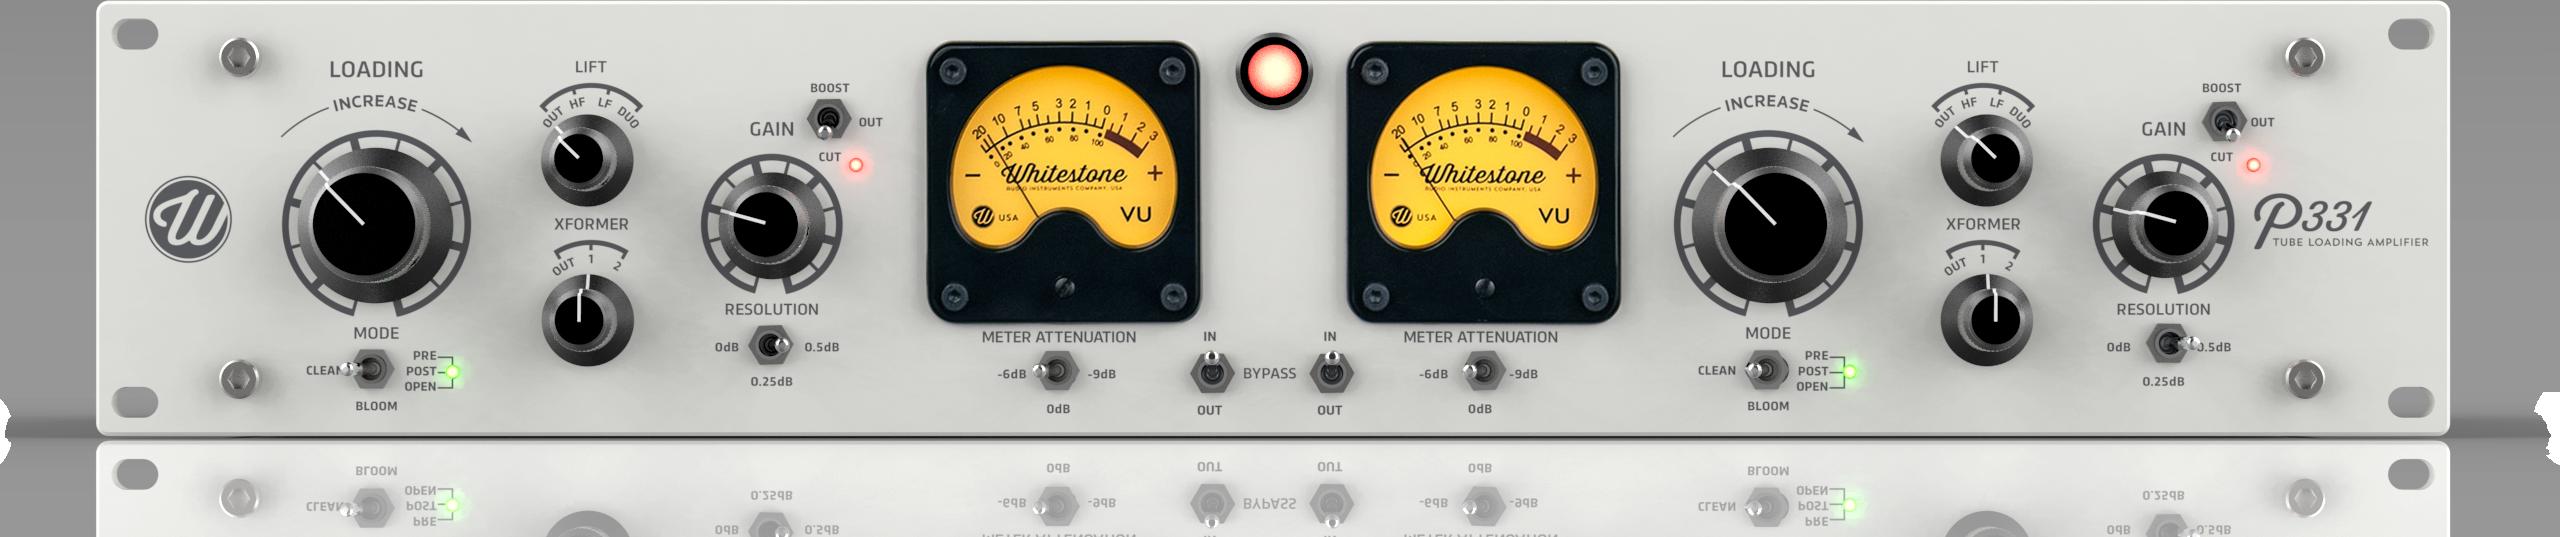 Whitestone® Audio P331 Tube Loading Amplifier